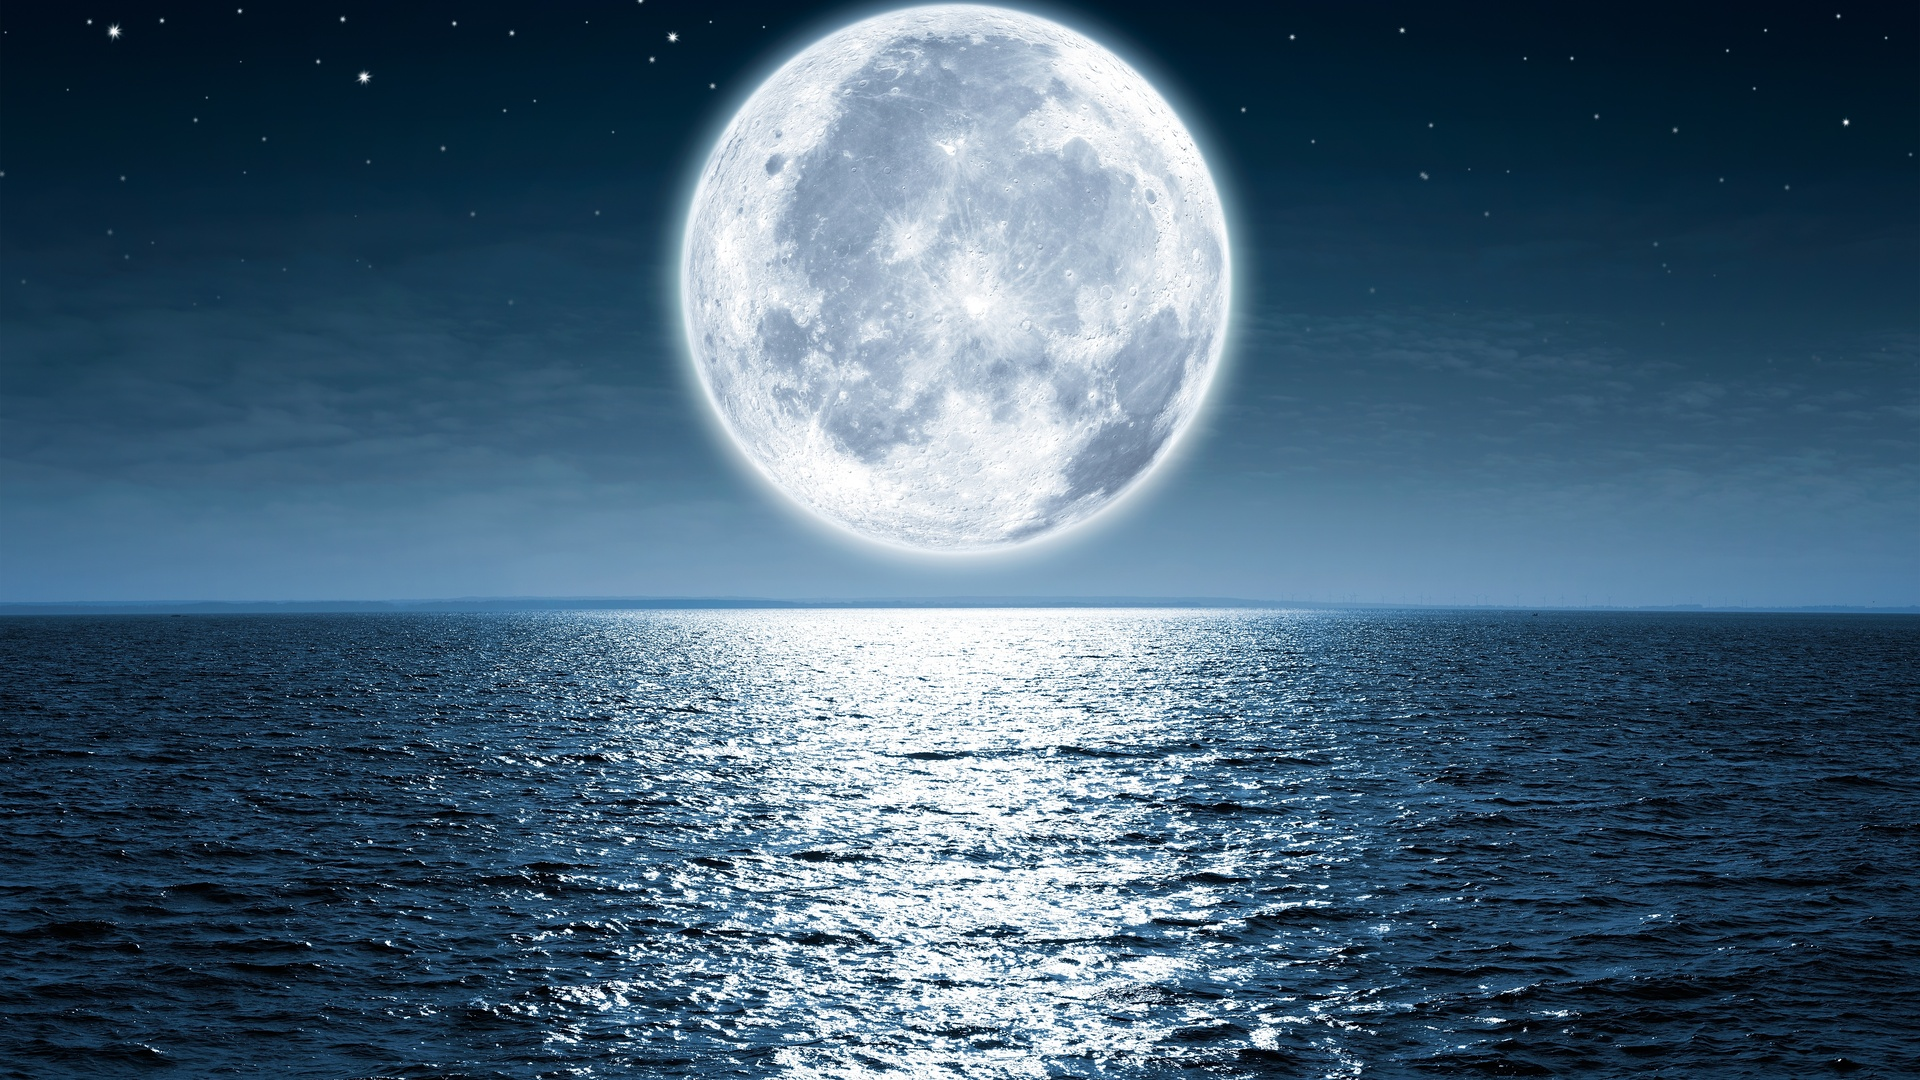 1920x1080 Moon Sea Night 5k Laptop Full Hd 1080p Hd 4k